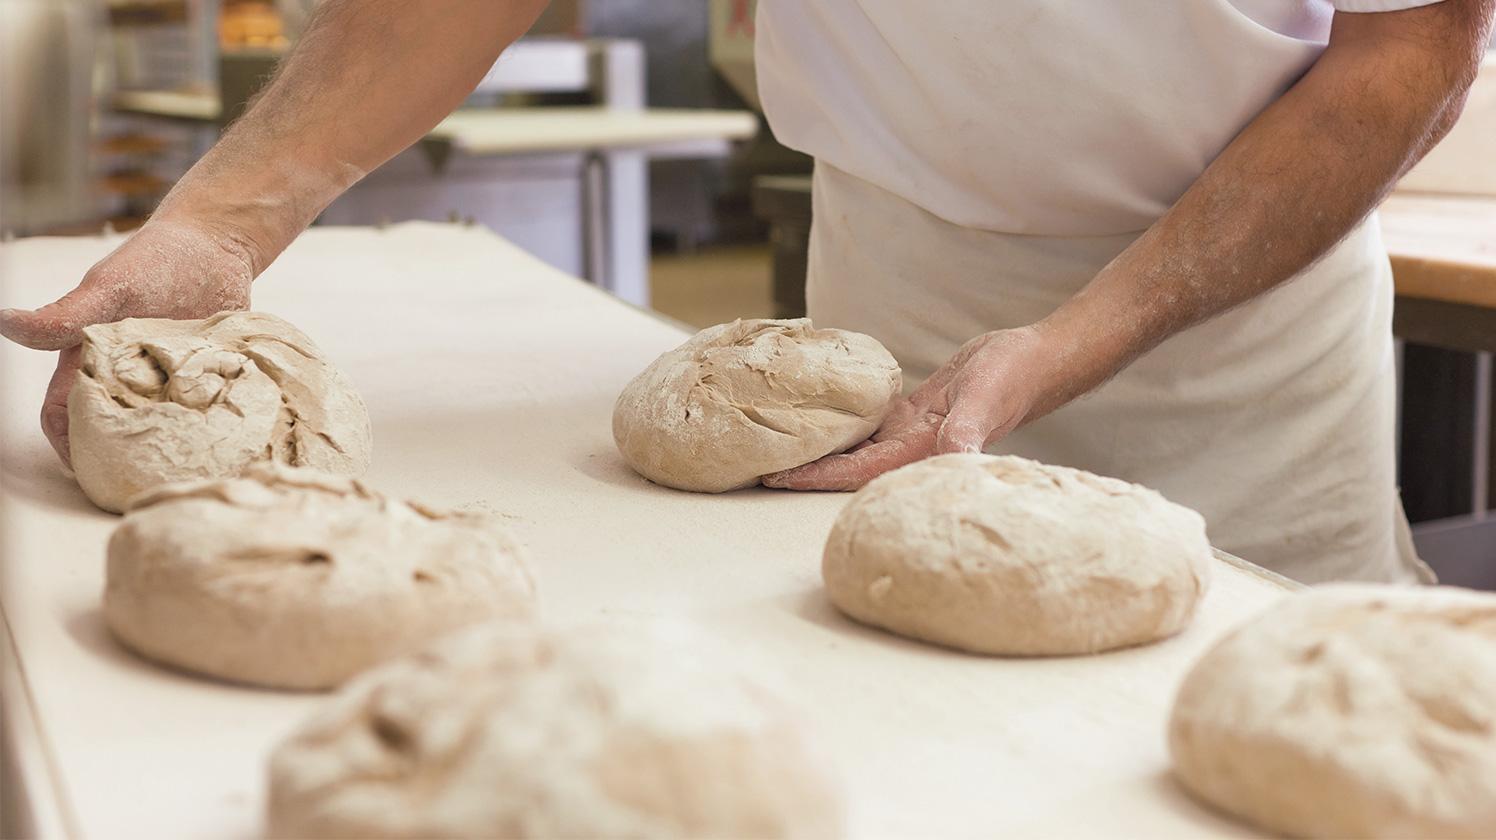 BRITA Filter PURITY C Steam Bäckerei Brotbacken